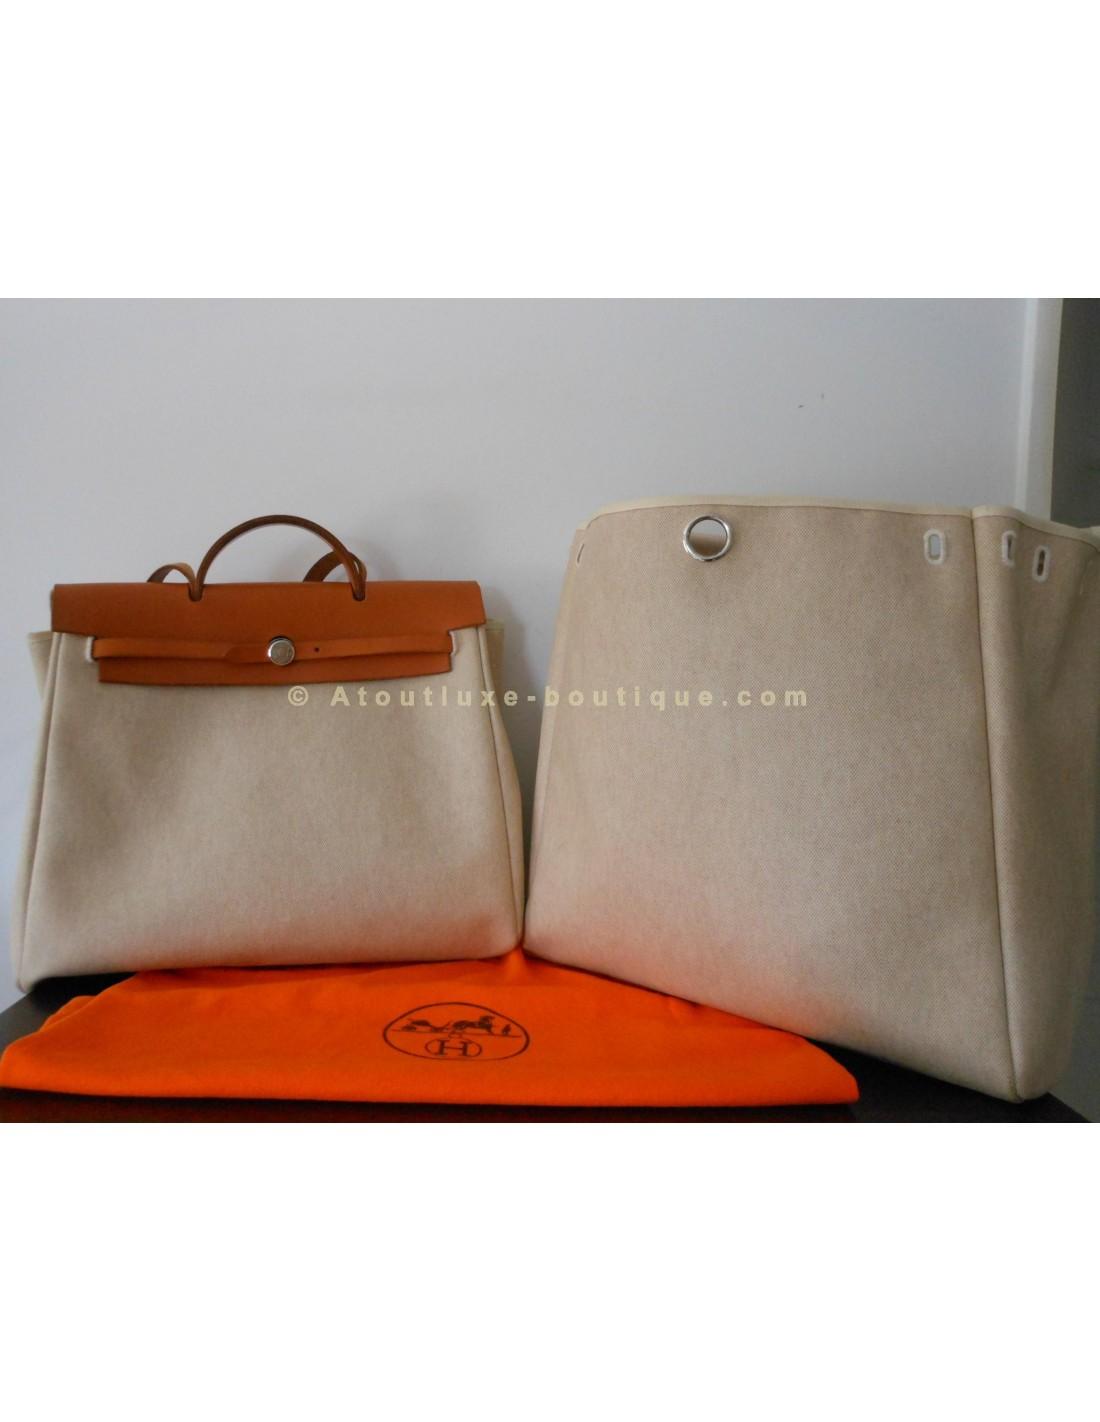 Atoutluxe Boutique Hermes Herbag Modele Sac Grand wP8ZNn0OkX